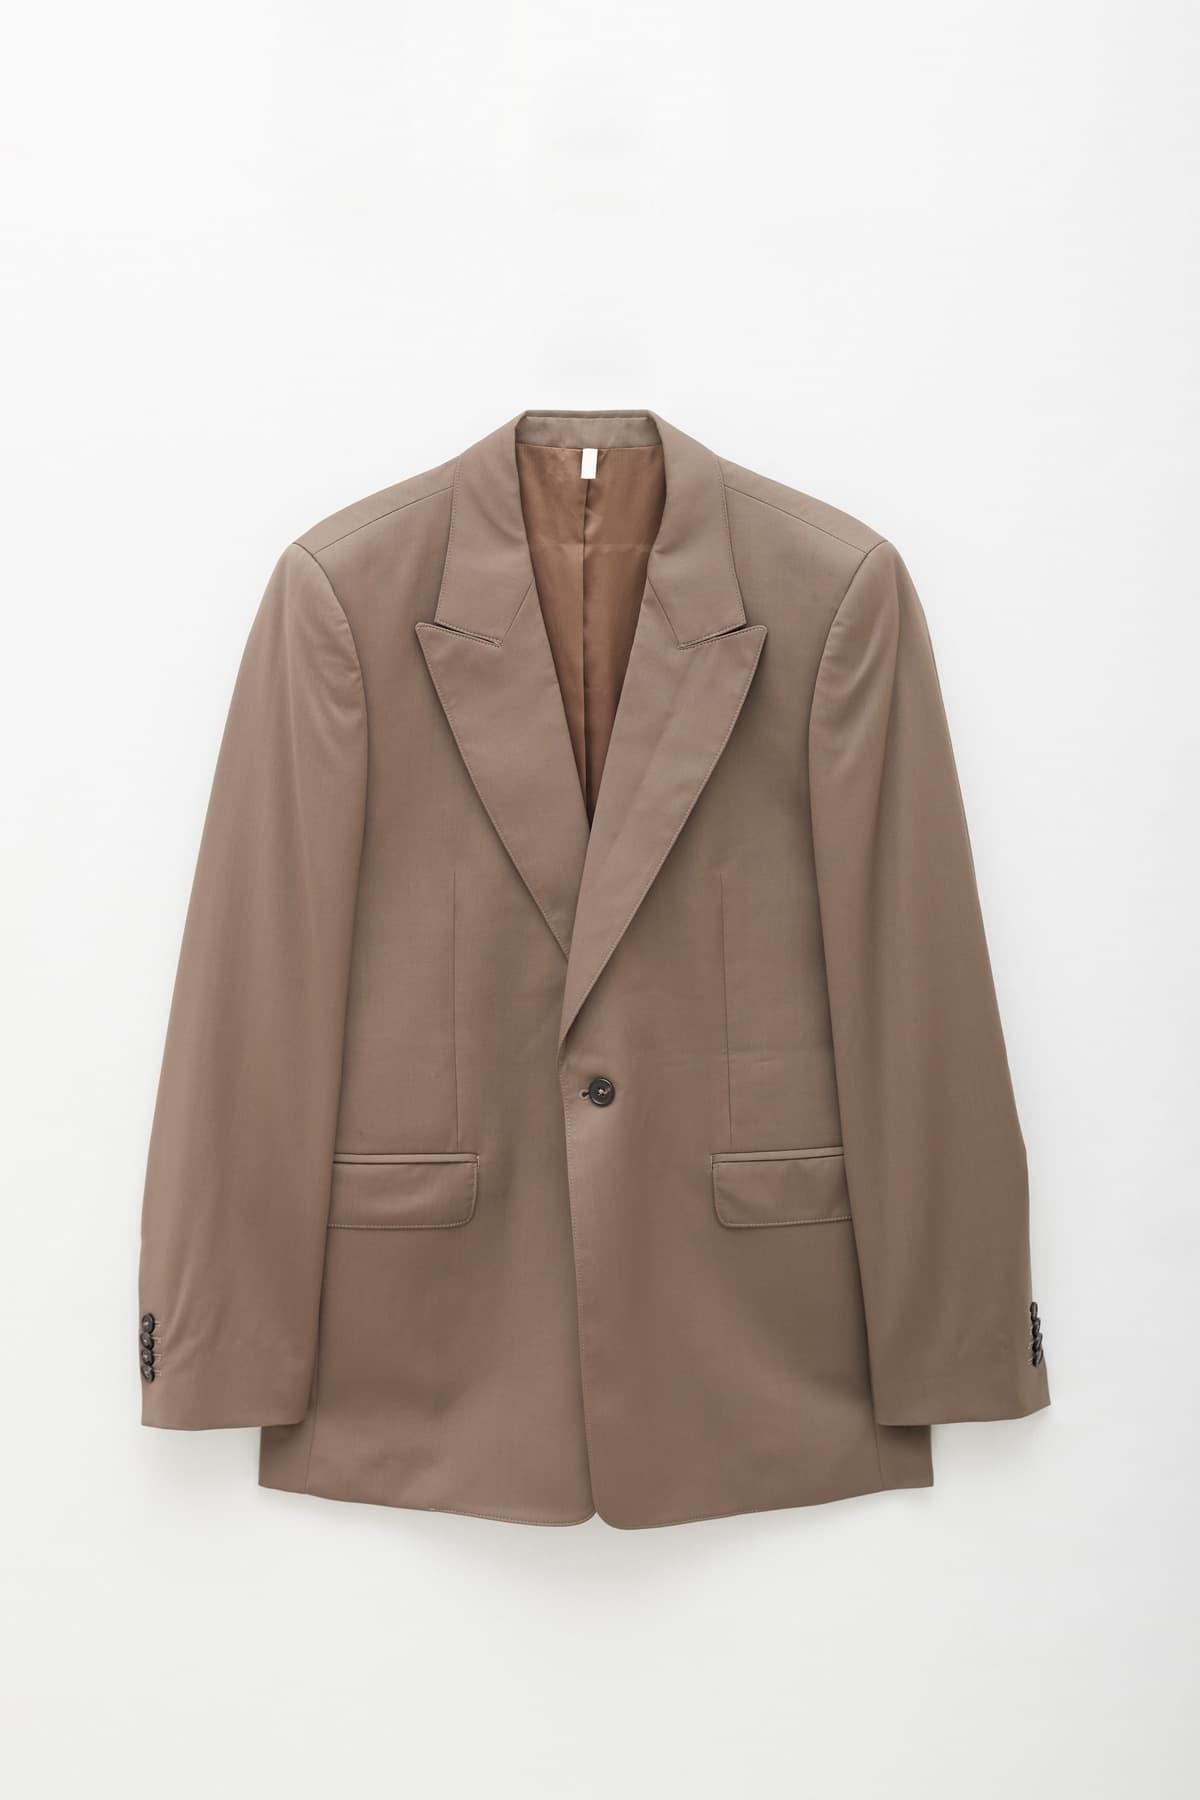 Shop Our Legacy Black Shaft Boots